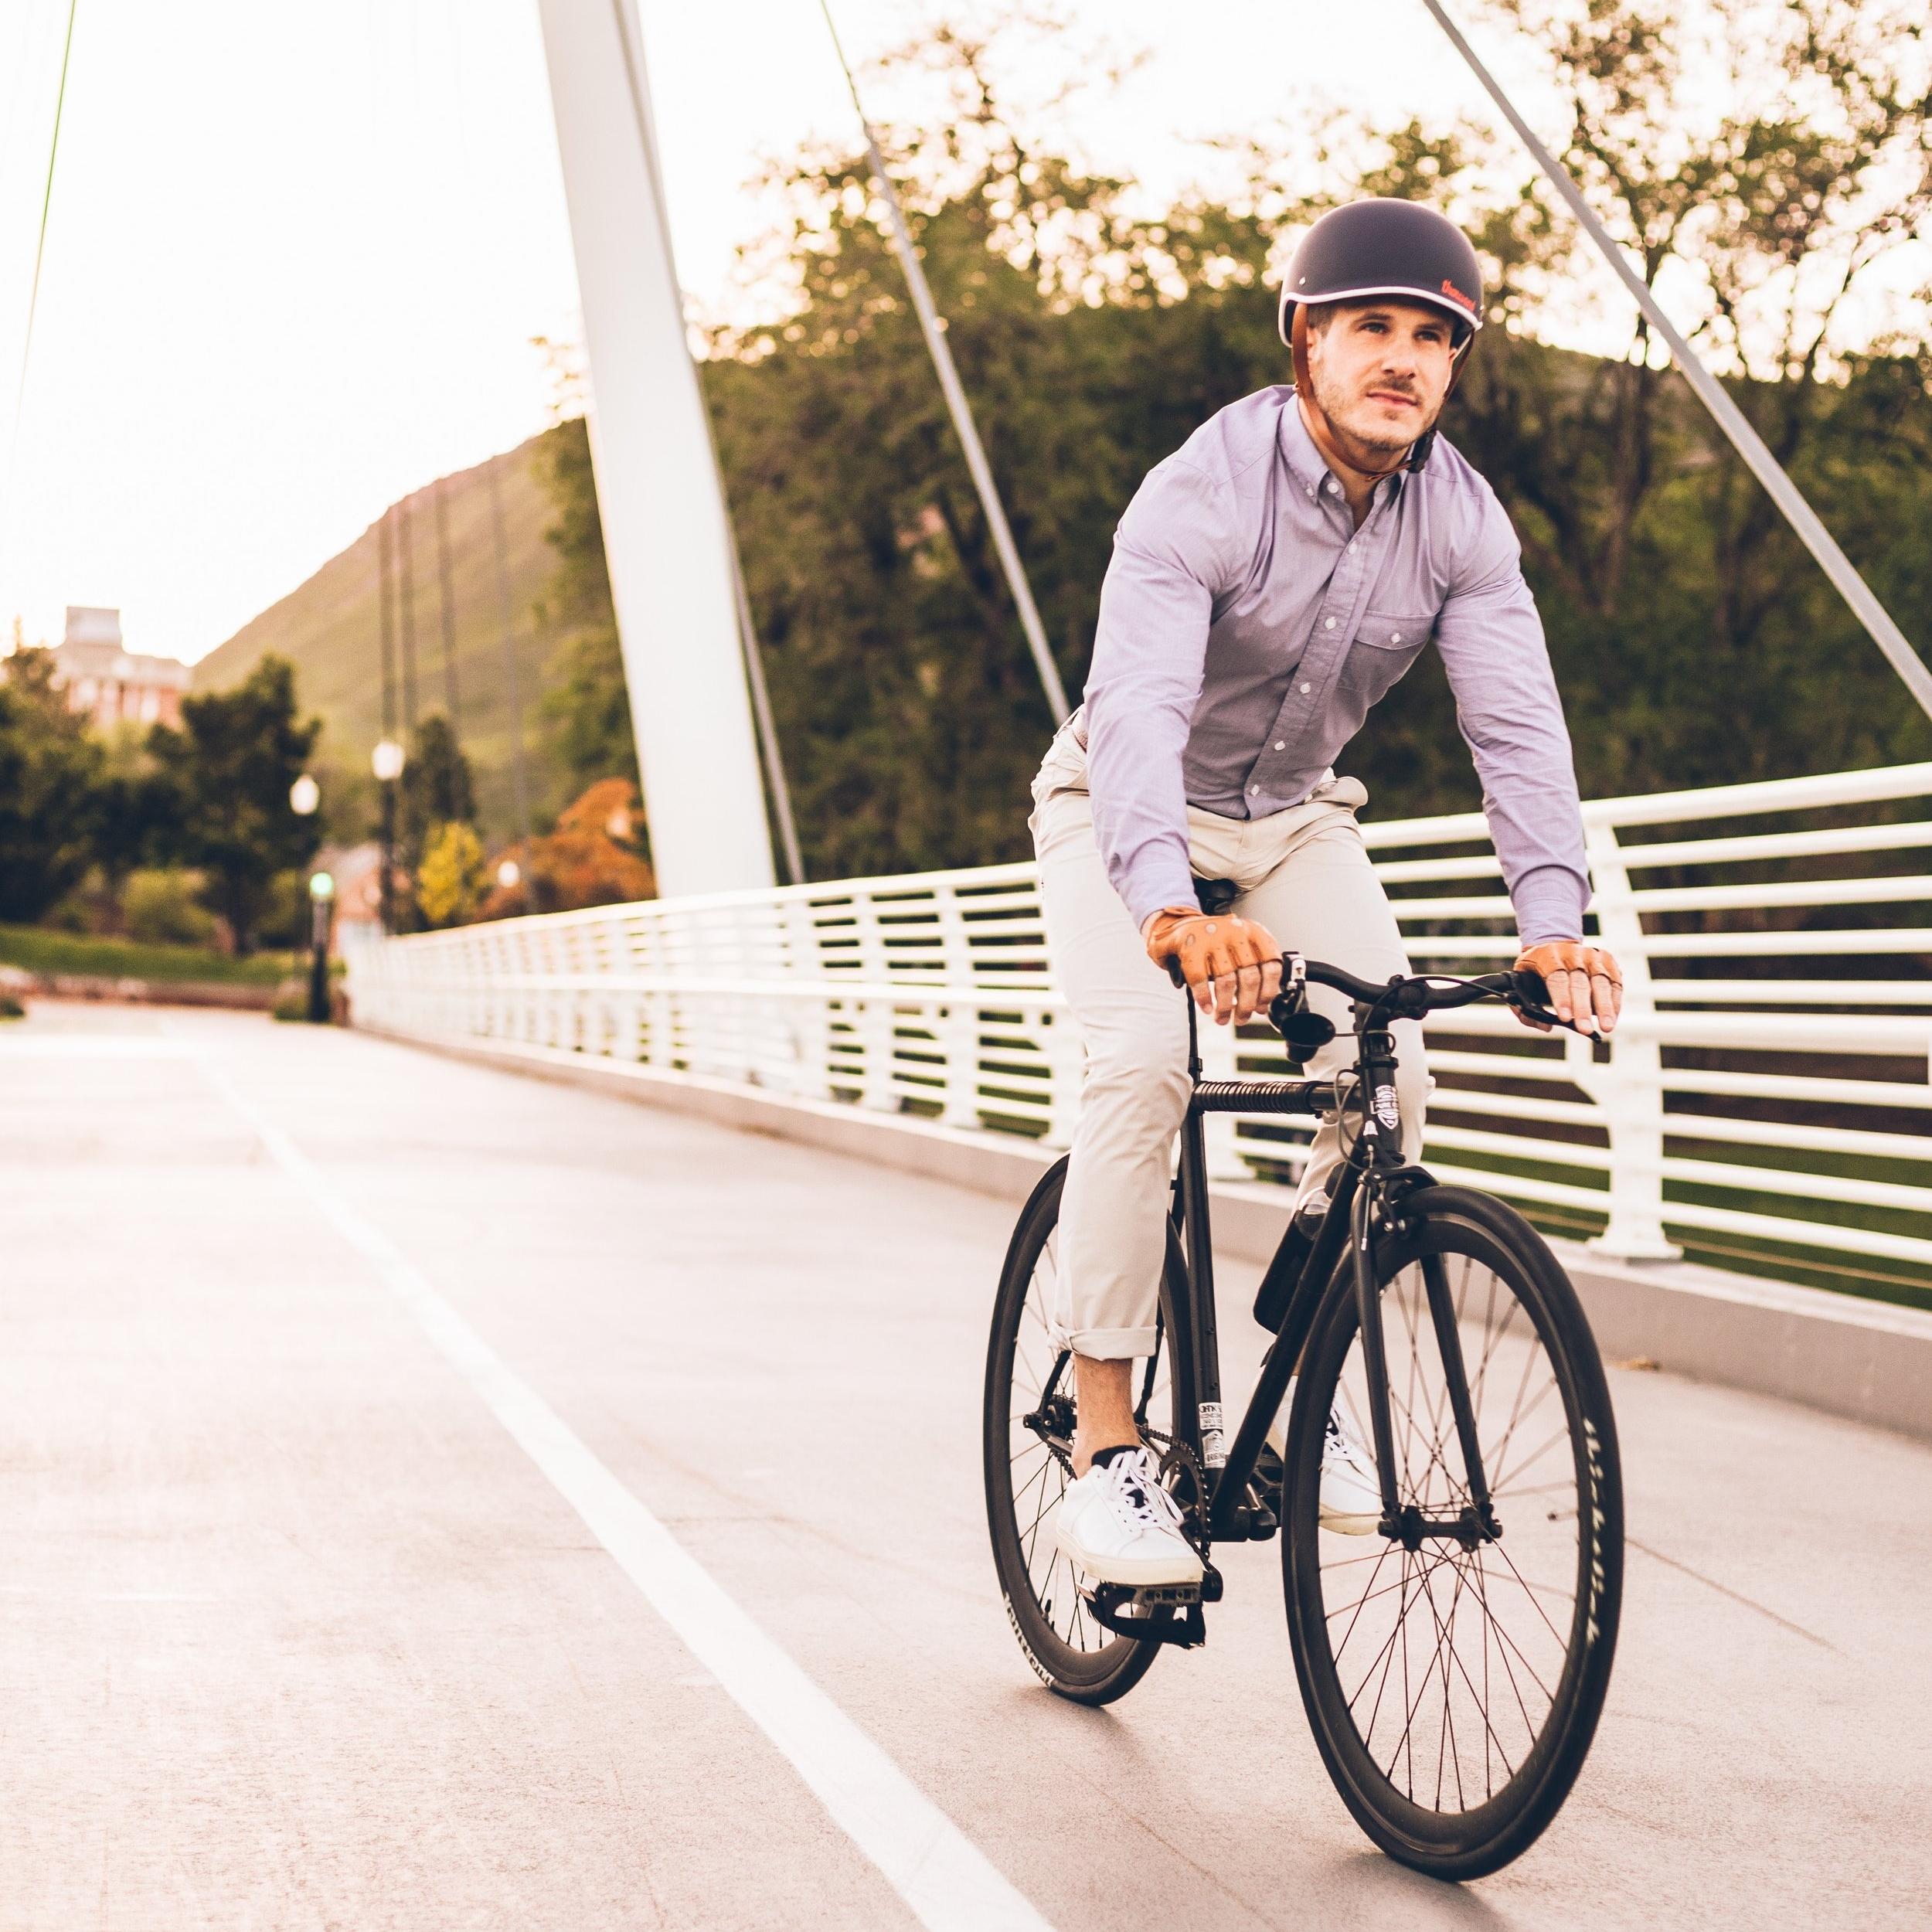 Cycle -